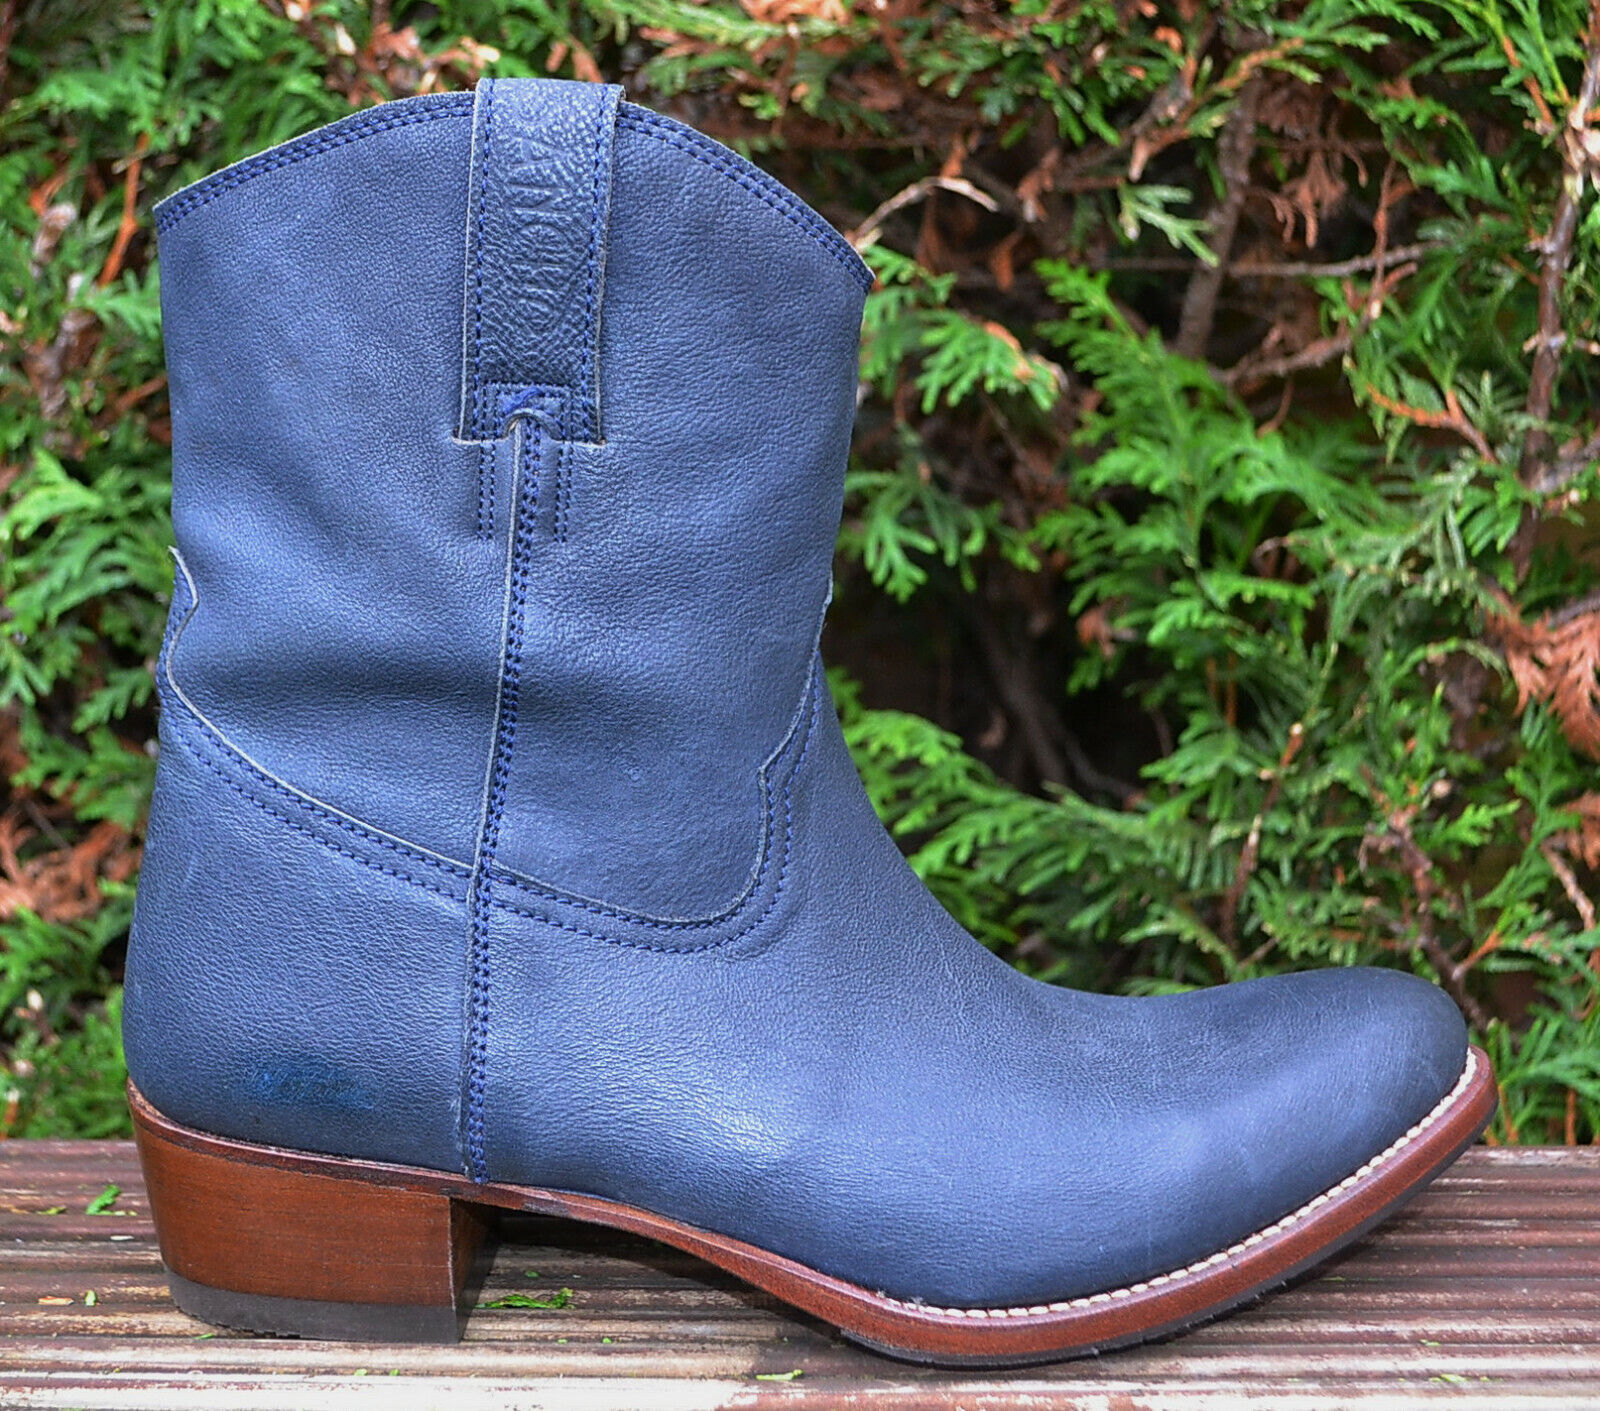 Sancho Gr.39 Stiefeletten Cowboy Stiefel Vintage Style Kurzstiefel Blau